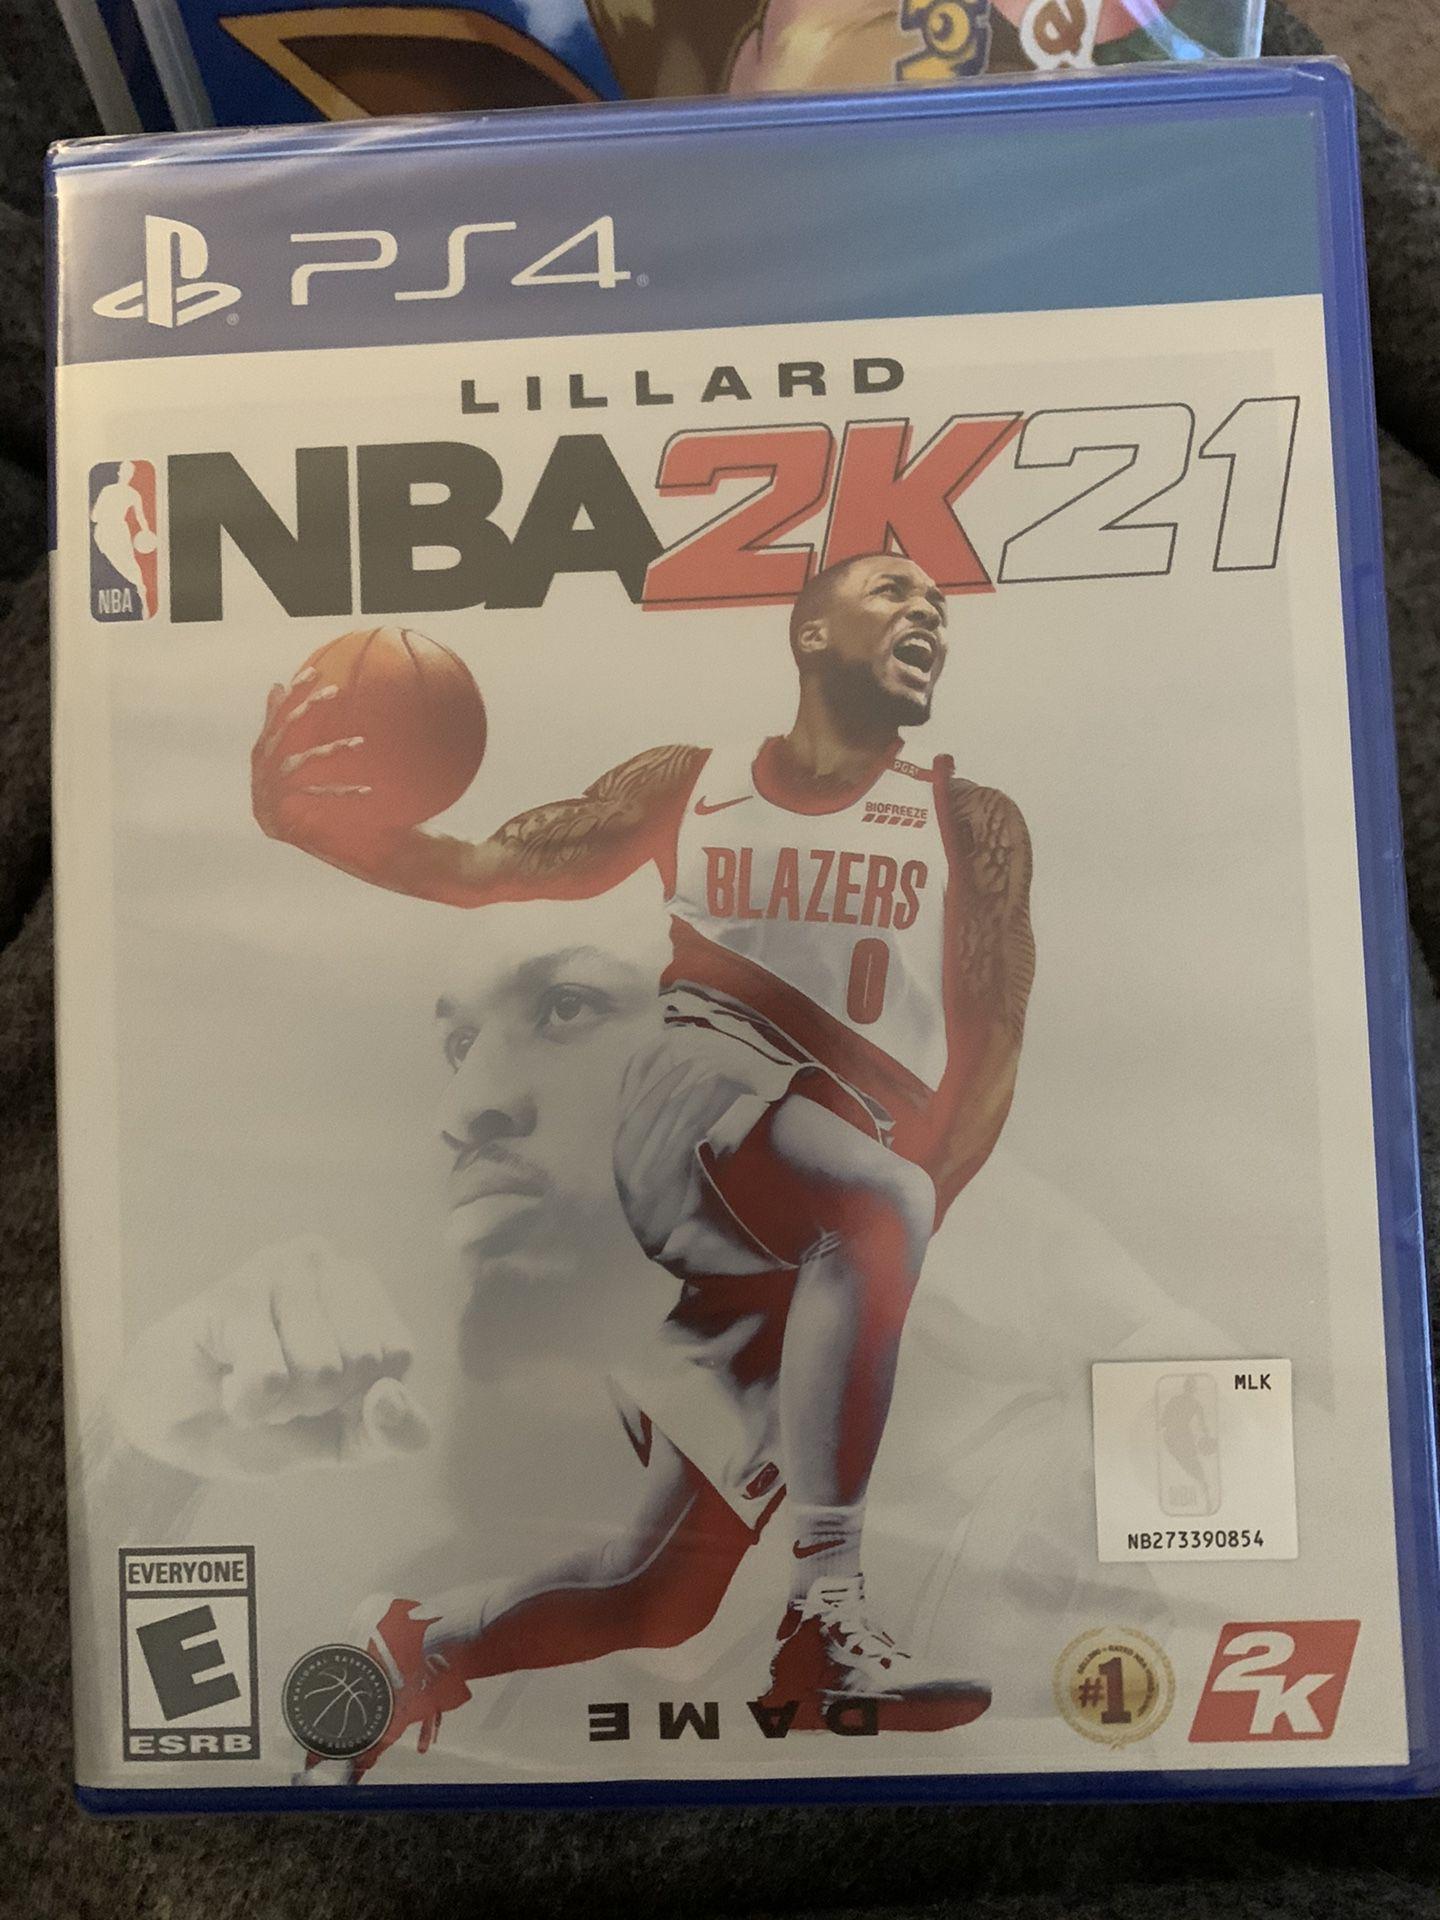 PS4 NBA 2K 21 Game